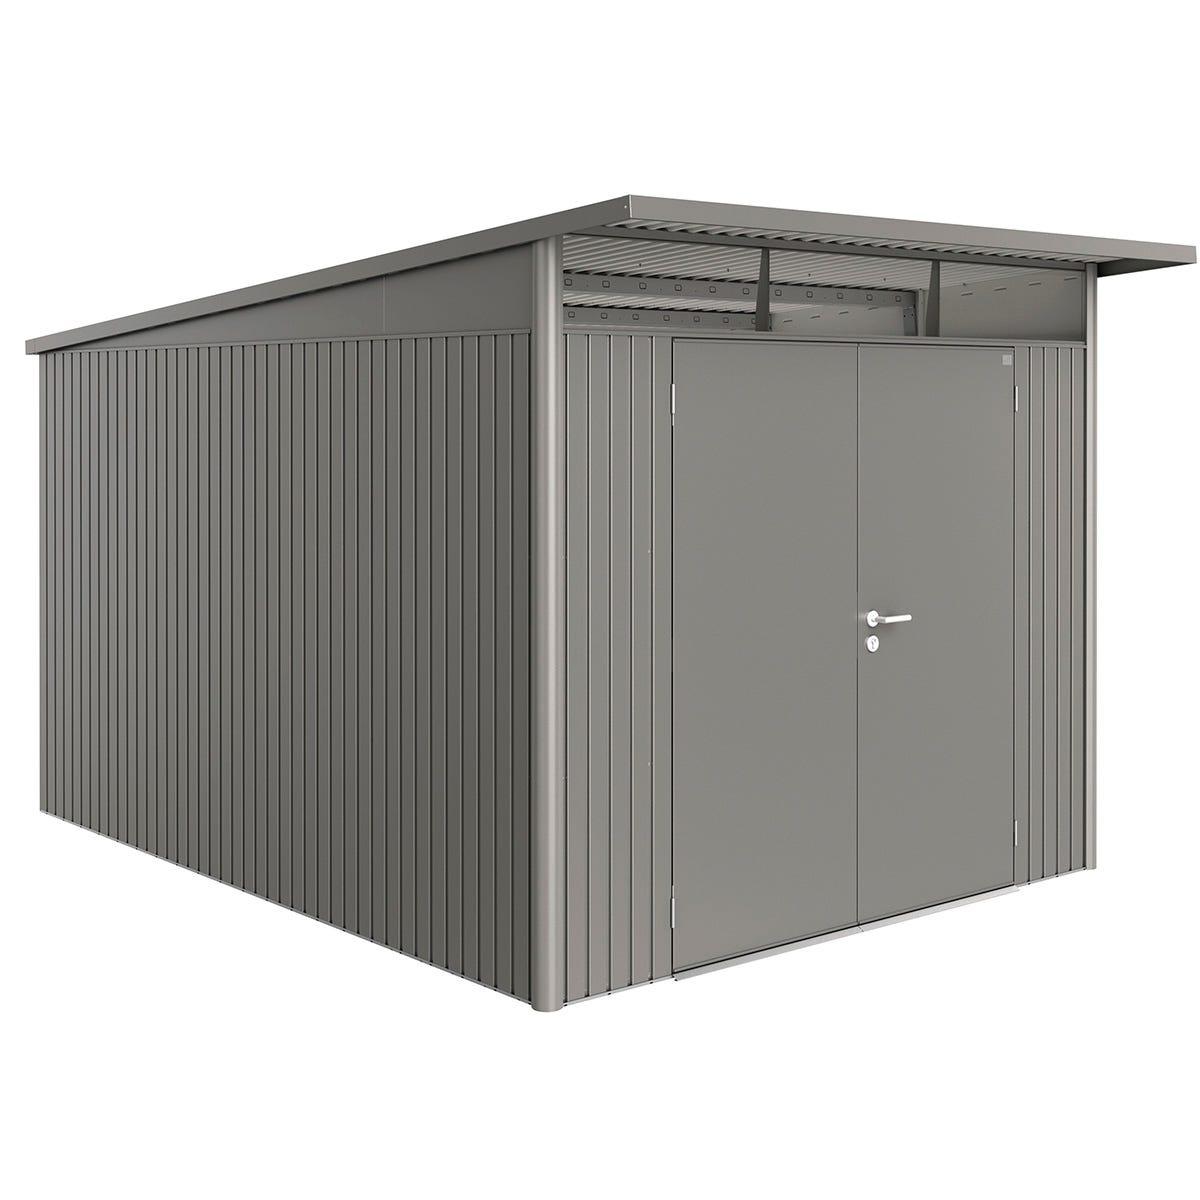 Biohort AvantGarde Metal Shed A8 Double door 8' 5'' x 12' 4'' - Quartz Grey